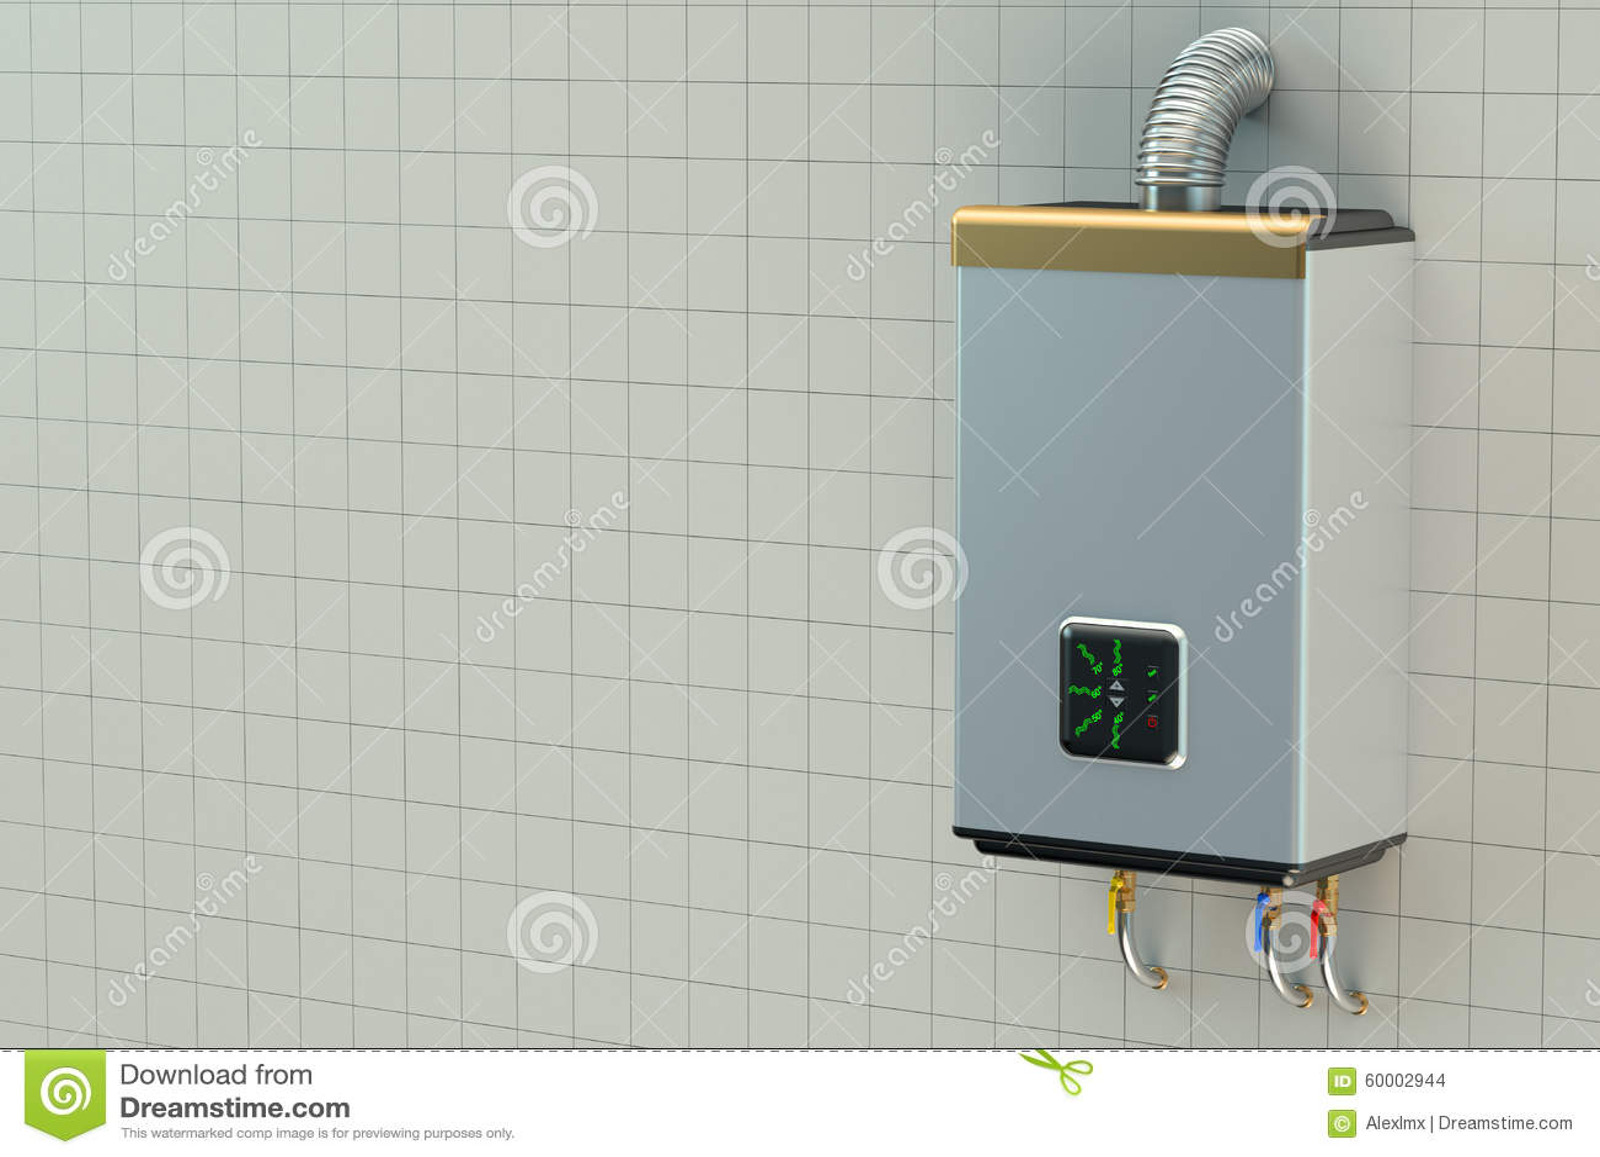 Home Gas Boiler, Water Heater Stock Illustration - Illustration of ...